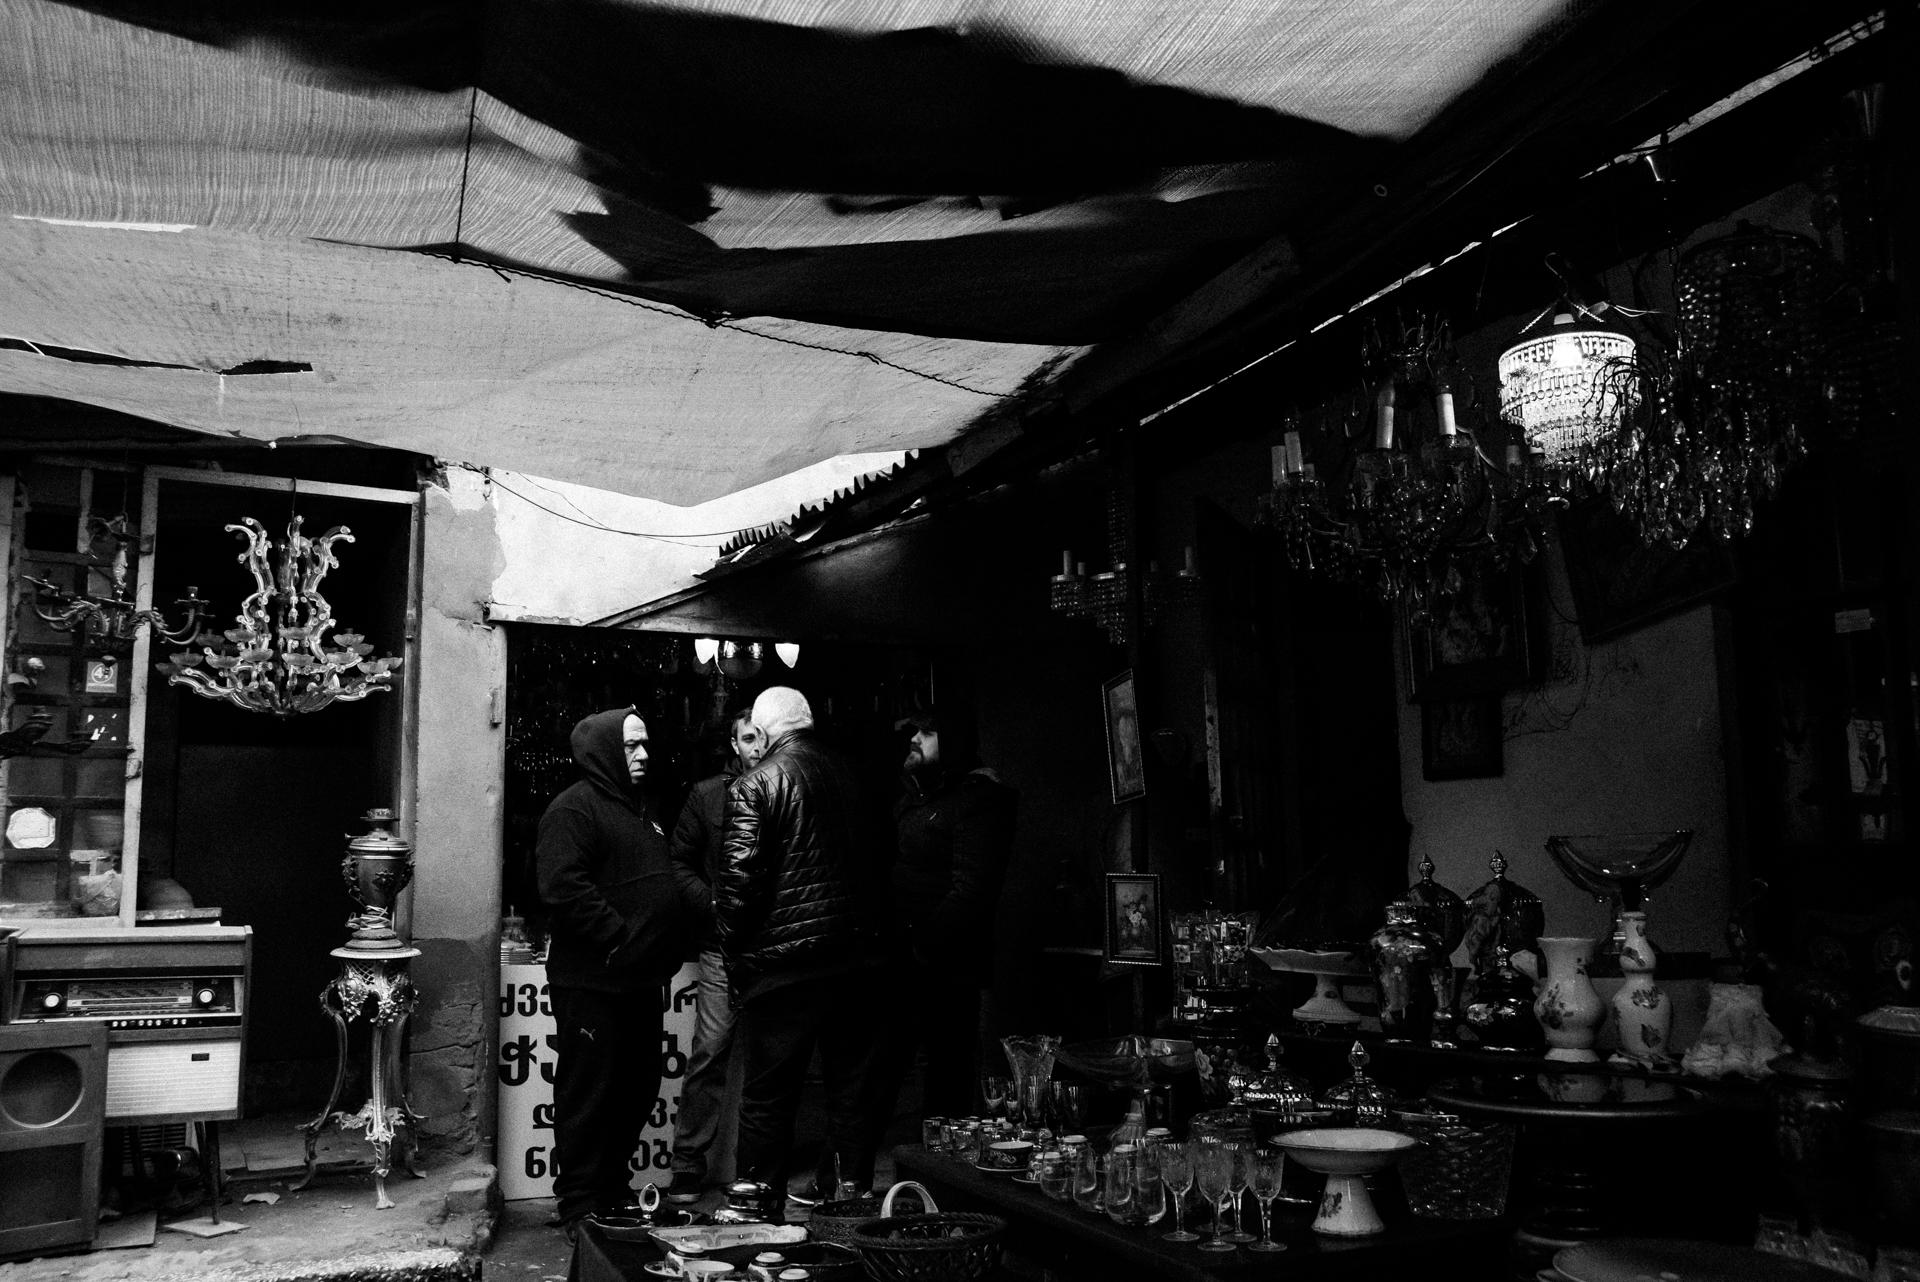 tbilisi-georgia-black-and-white-photography (7).jpg